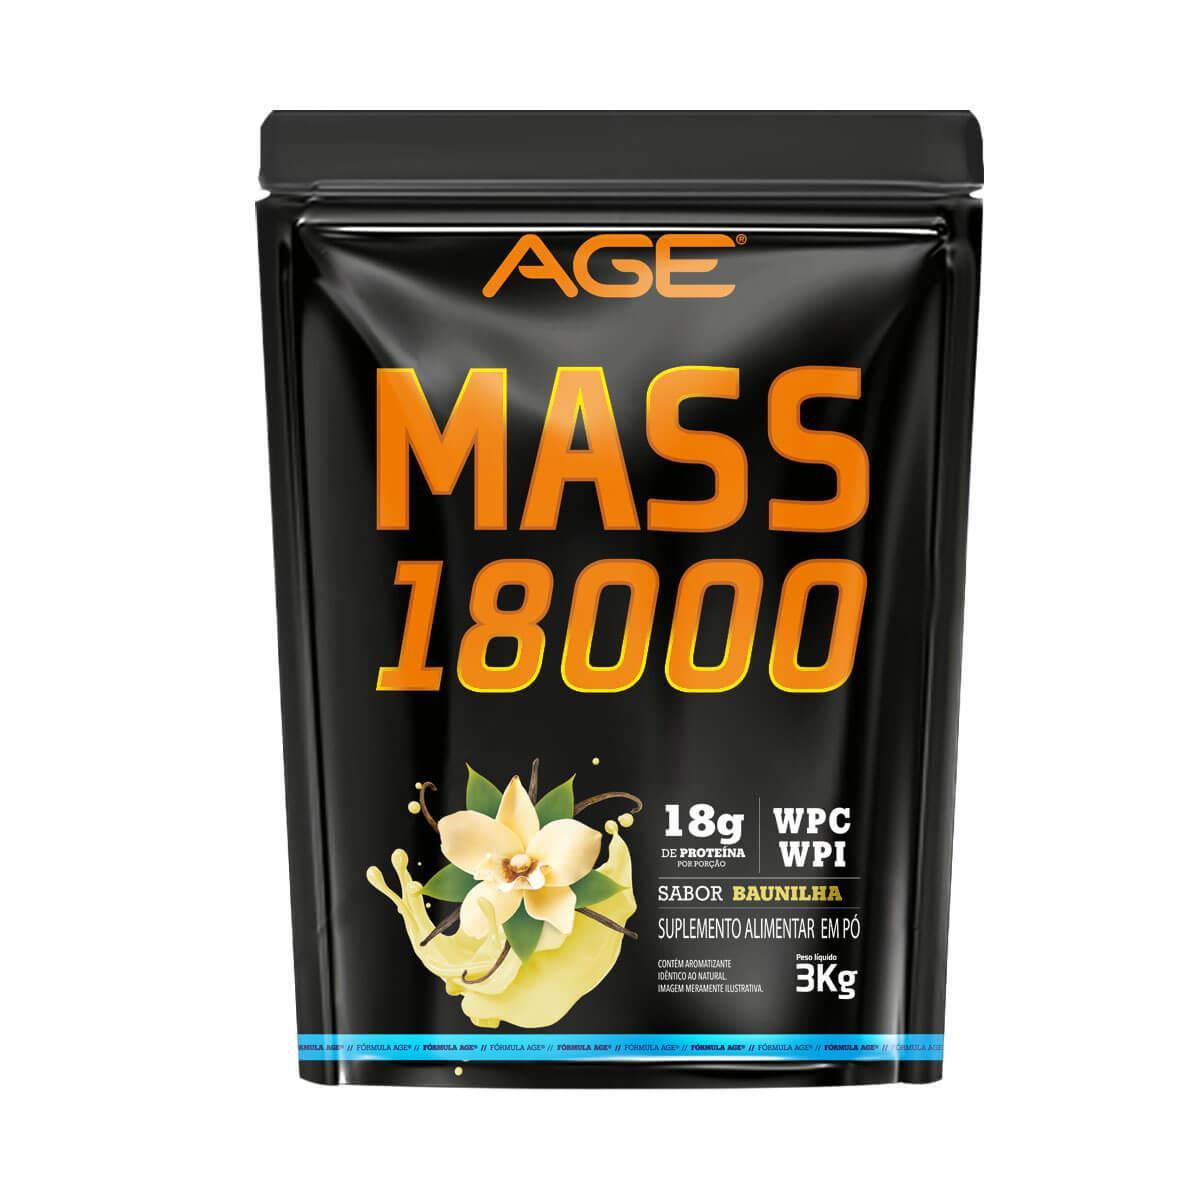 MASS 18000 (3Kg) - Baunilha - AGE